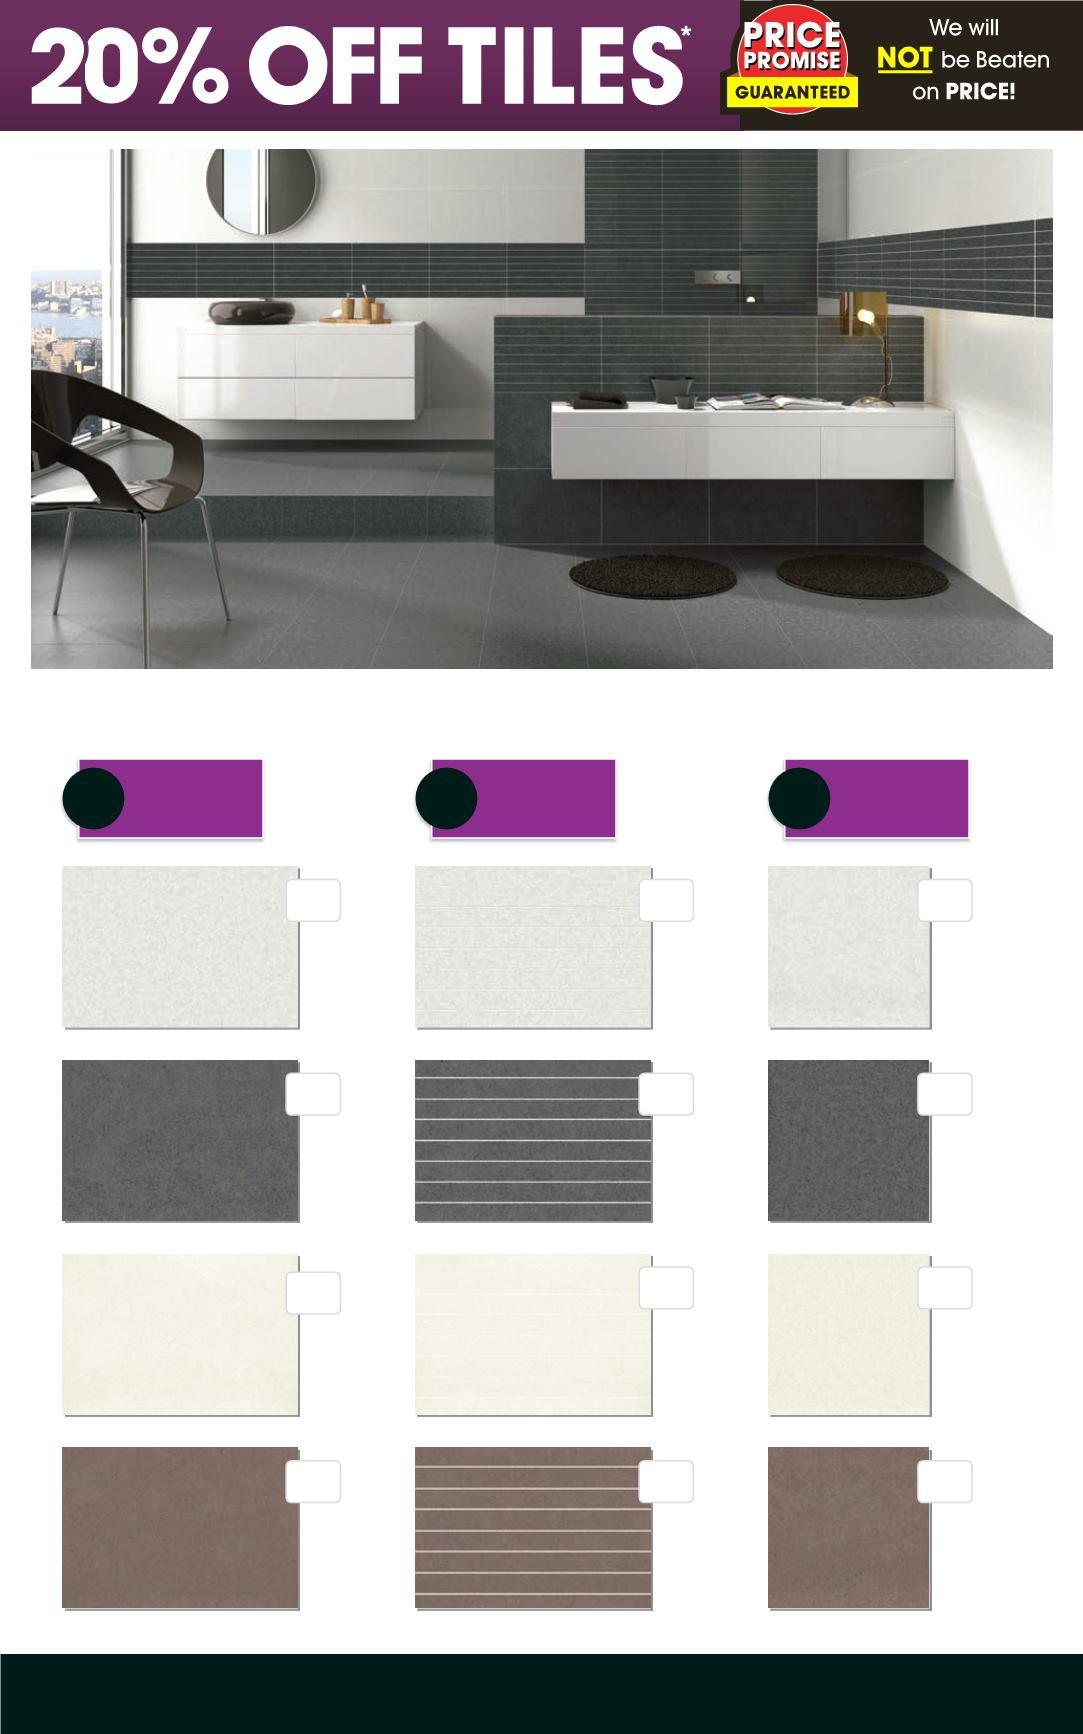 Better bathrooms sale - Better Bathrooms April Showers Sale Deal Sheet Page 10